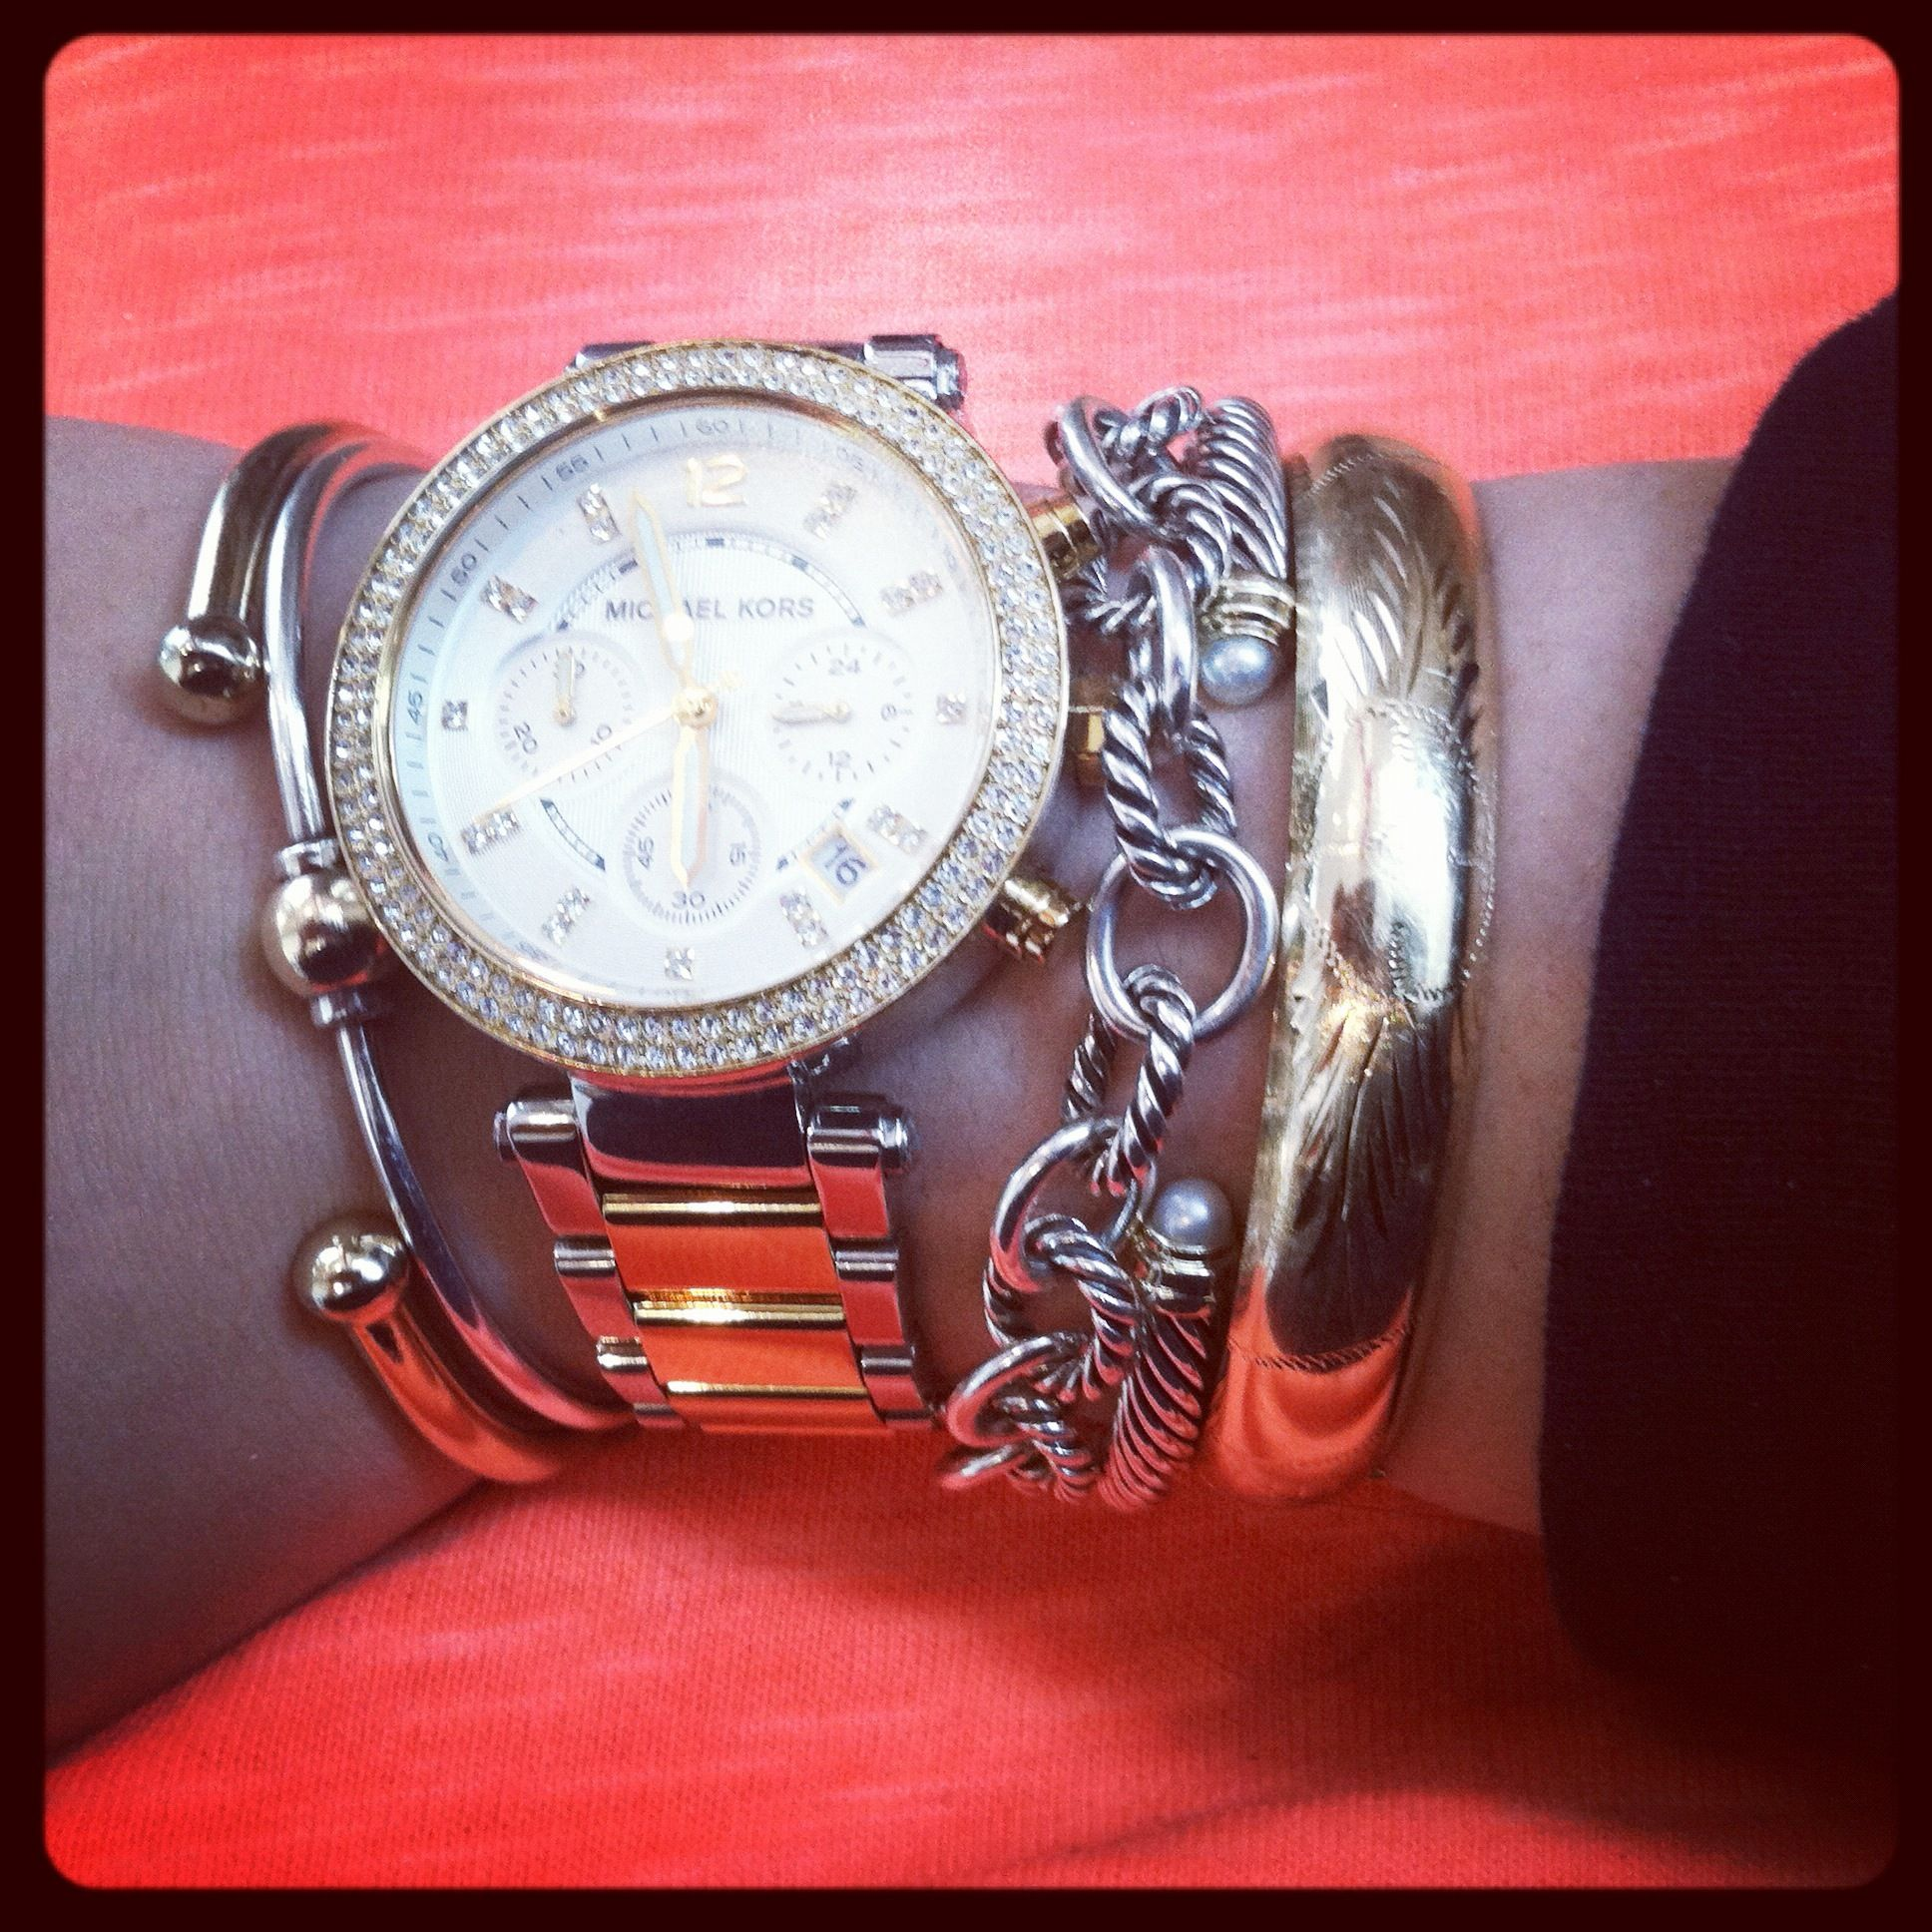 Love all the bracelets